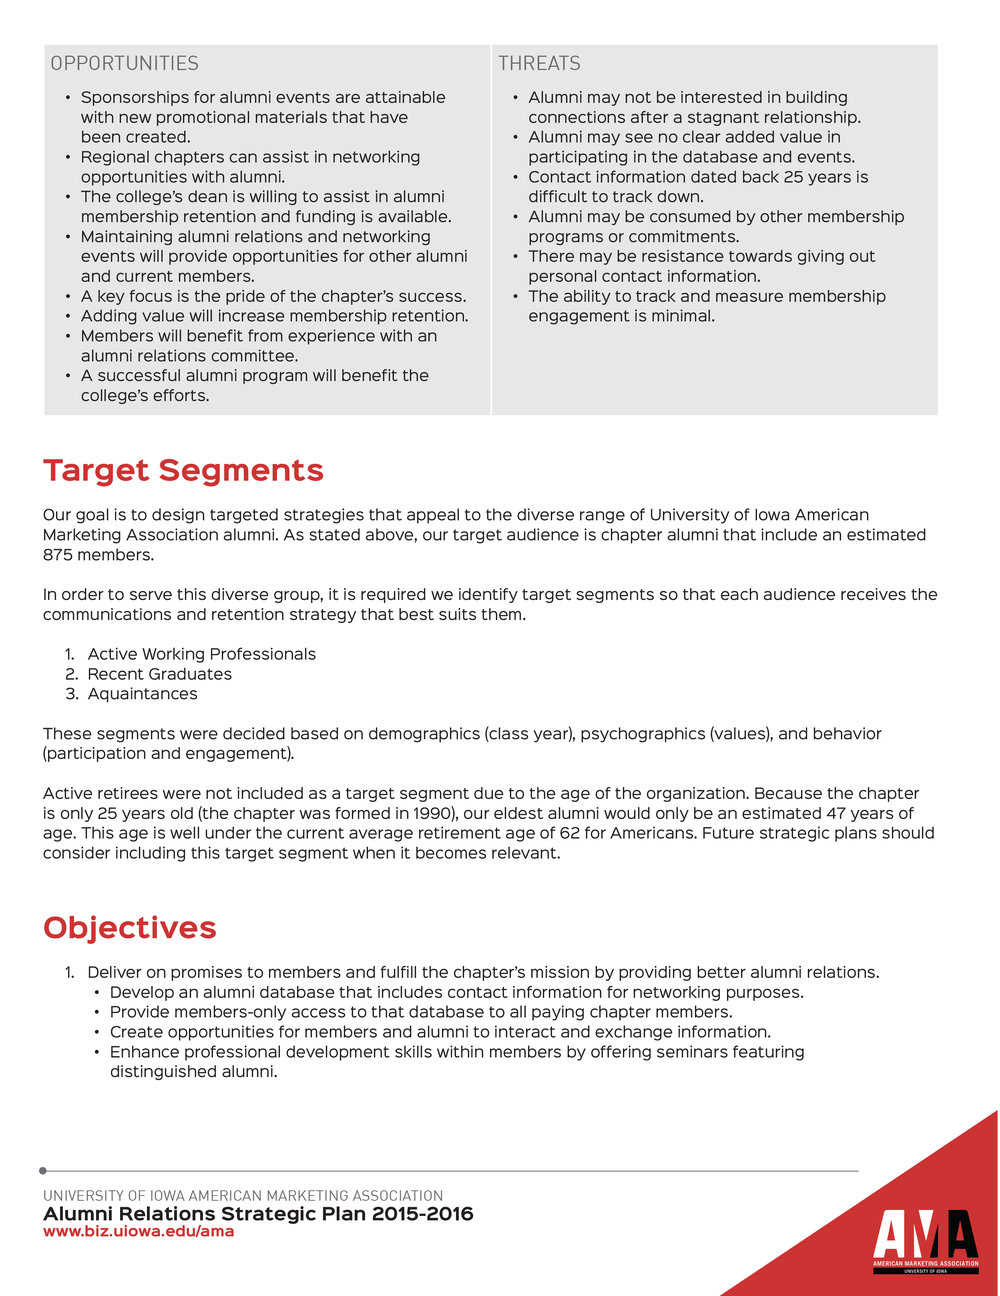 ama_alumnistrategicplan-4.jpg